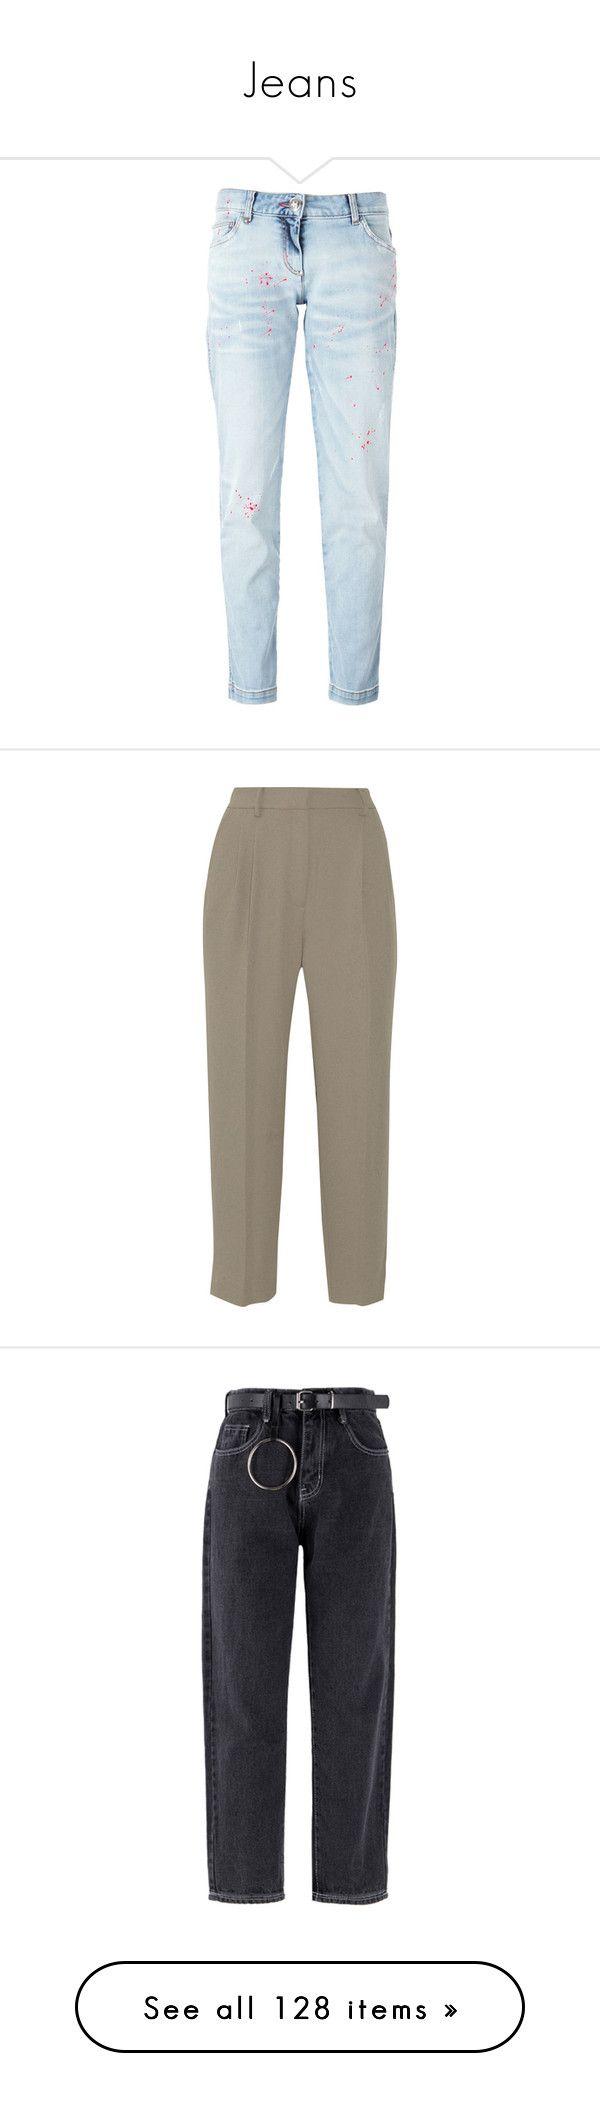 """Jeans"" by tacoxcat ❤ liked on Polyvore featuring jeans, pants, bottoms, pantalones, blue, 5 pocket jeans, philipp plein, paint splatter jeans, philipp plein jeans and boyfriend fit jeans"